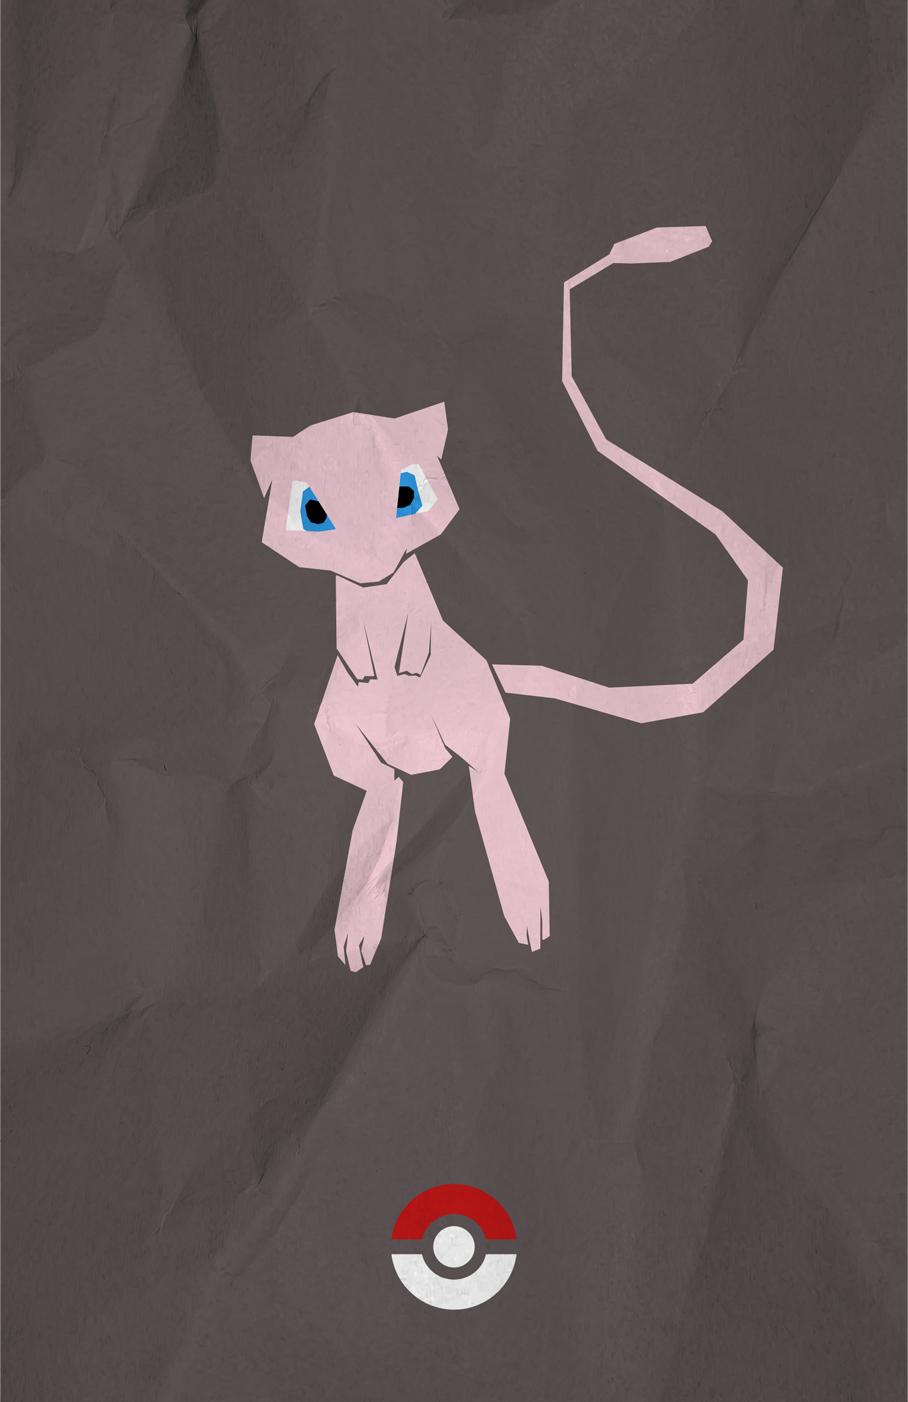 2016_7_20 - Pokemon 6.jpg